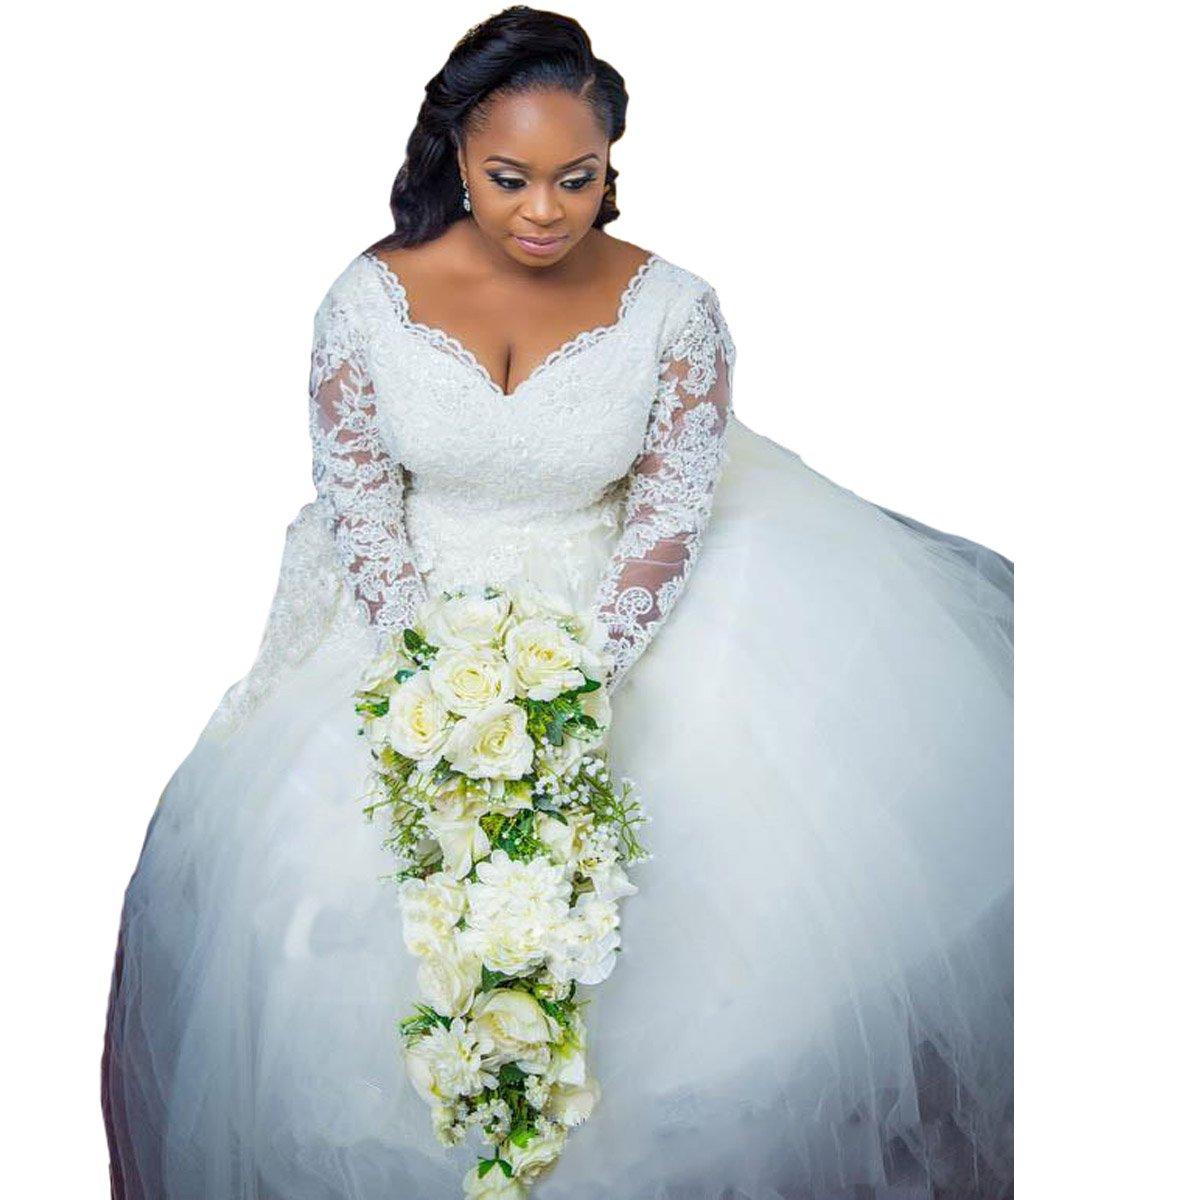 Yuxin Modest Plus Size Wedding Dresses 2019 V Neck Lace Long ...